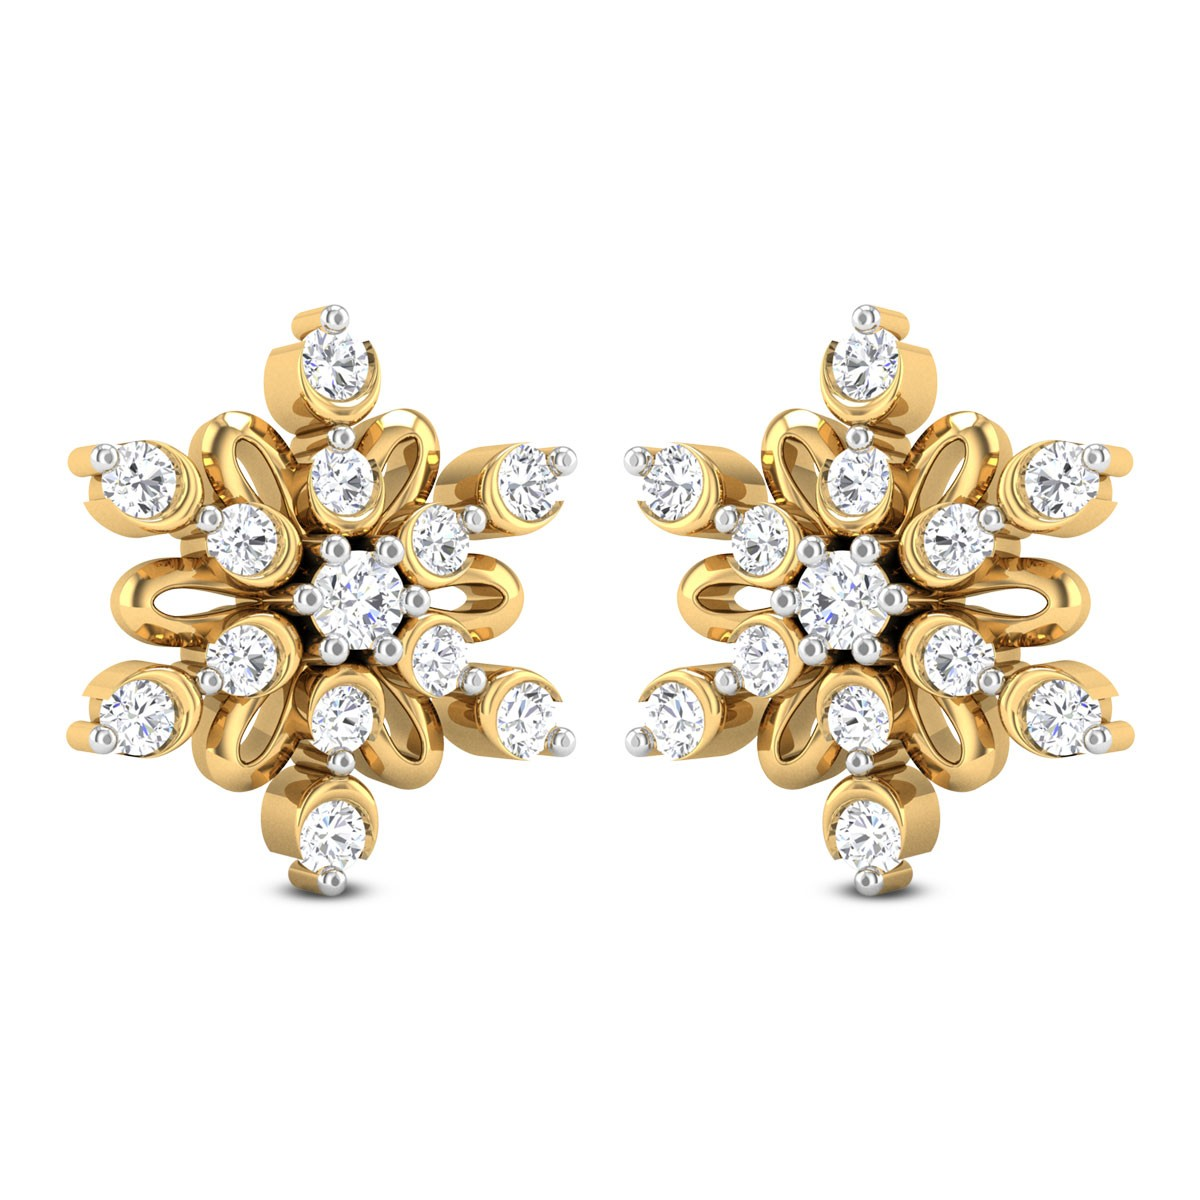 Maren Floral Diamond Stud Earrings